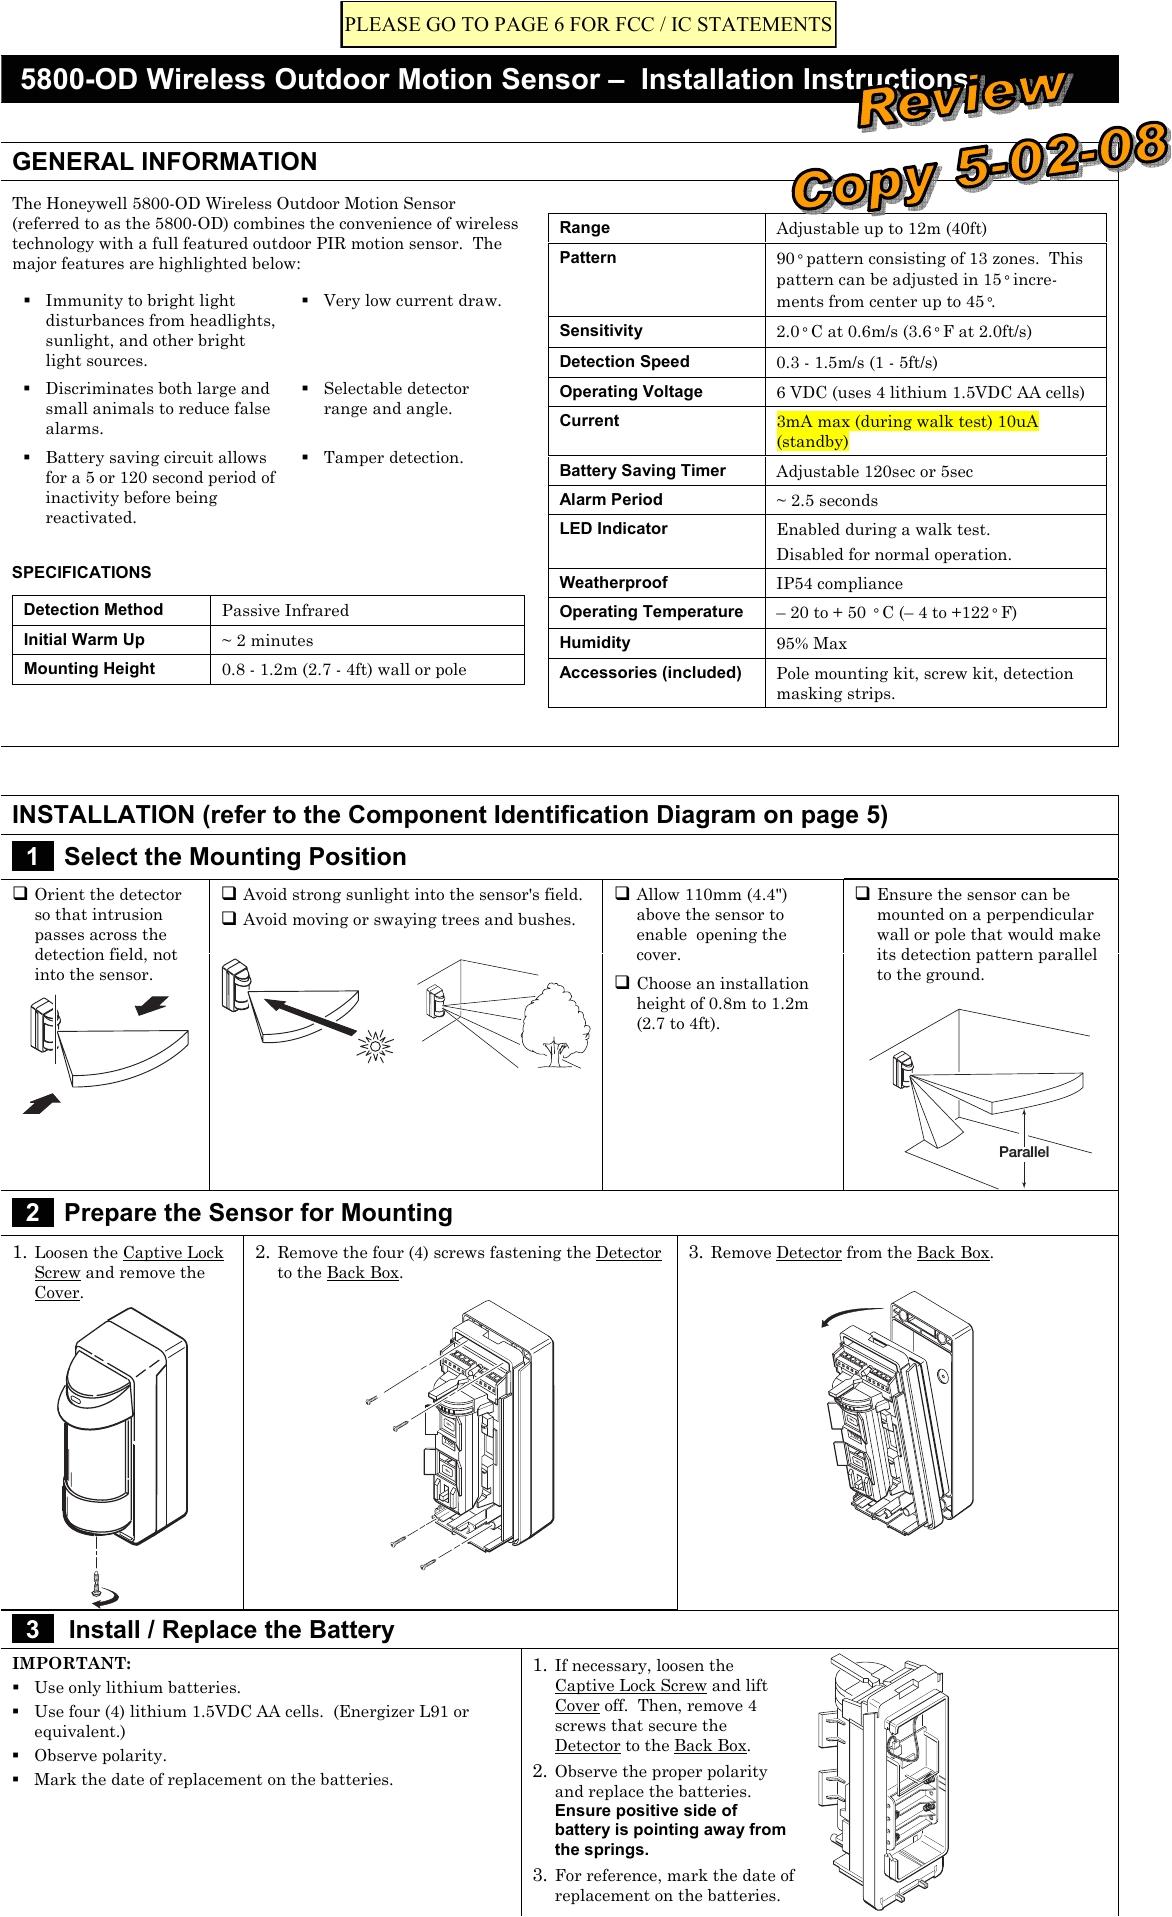 8dl5800pir od security transmitter user manual 5890 od wireless outdoor motion sensor honeywell international inc